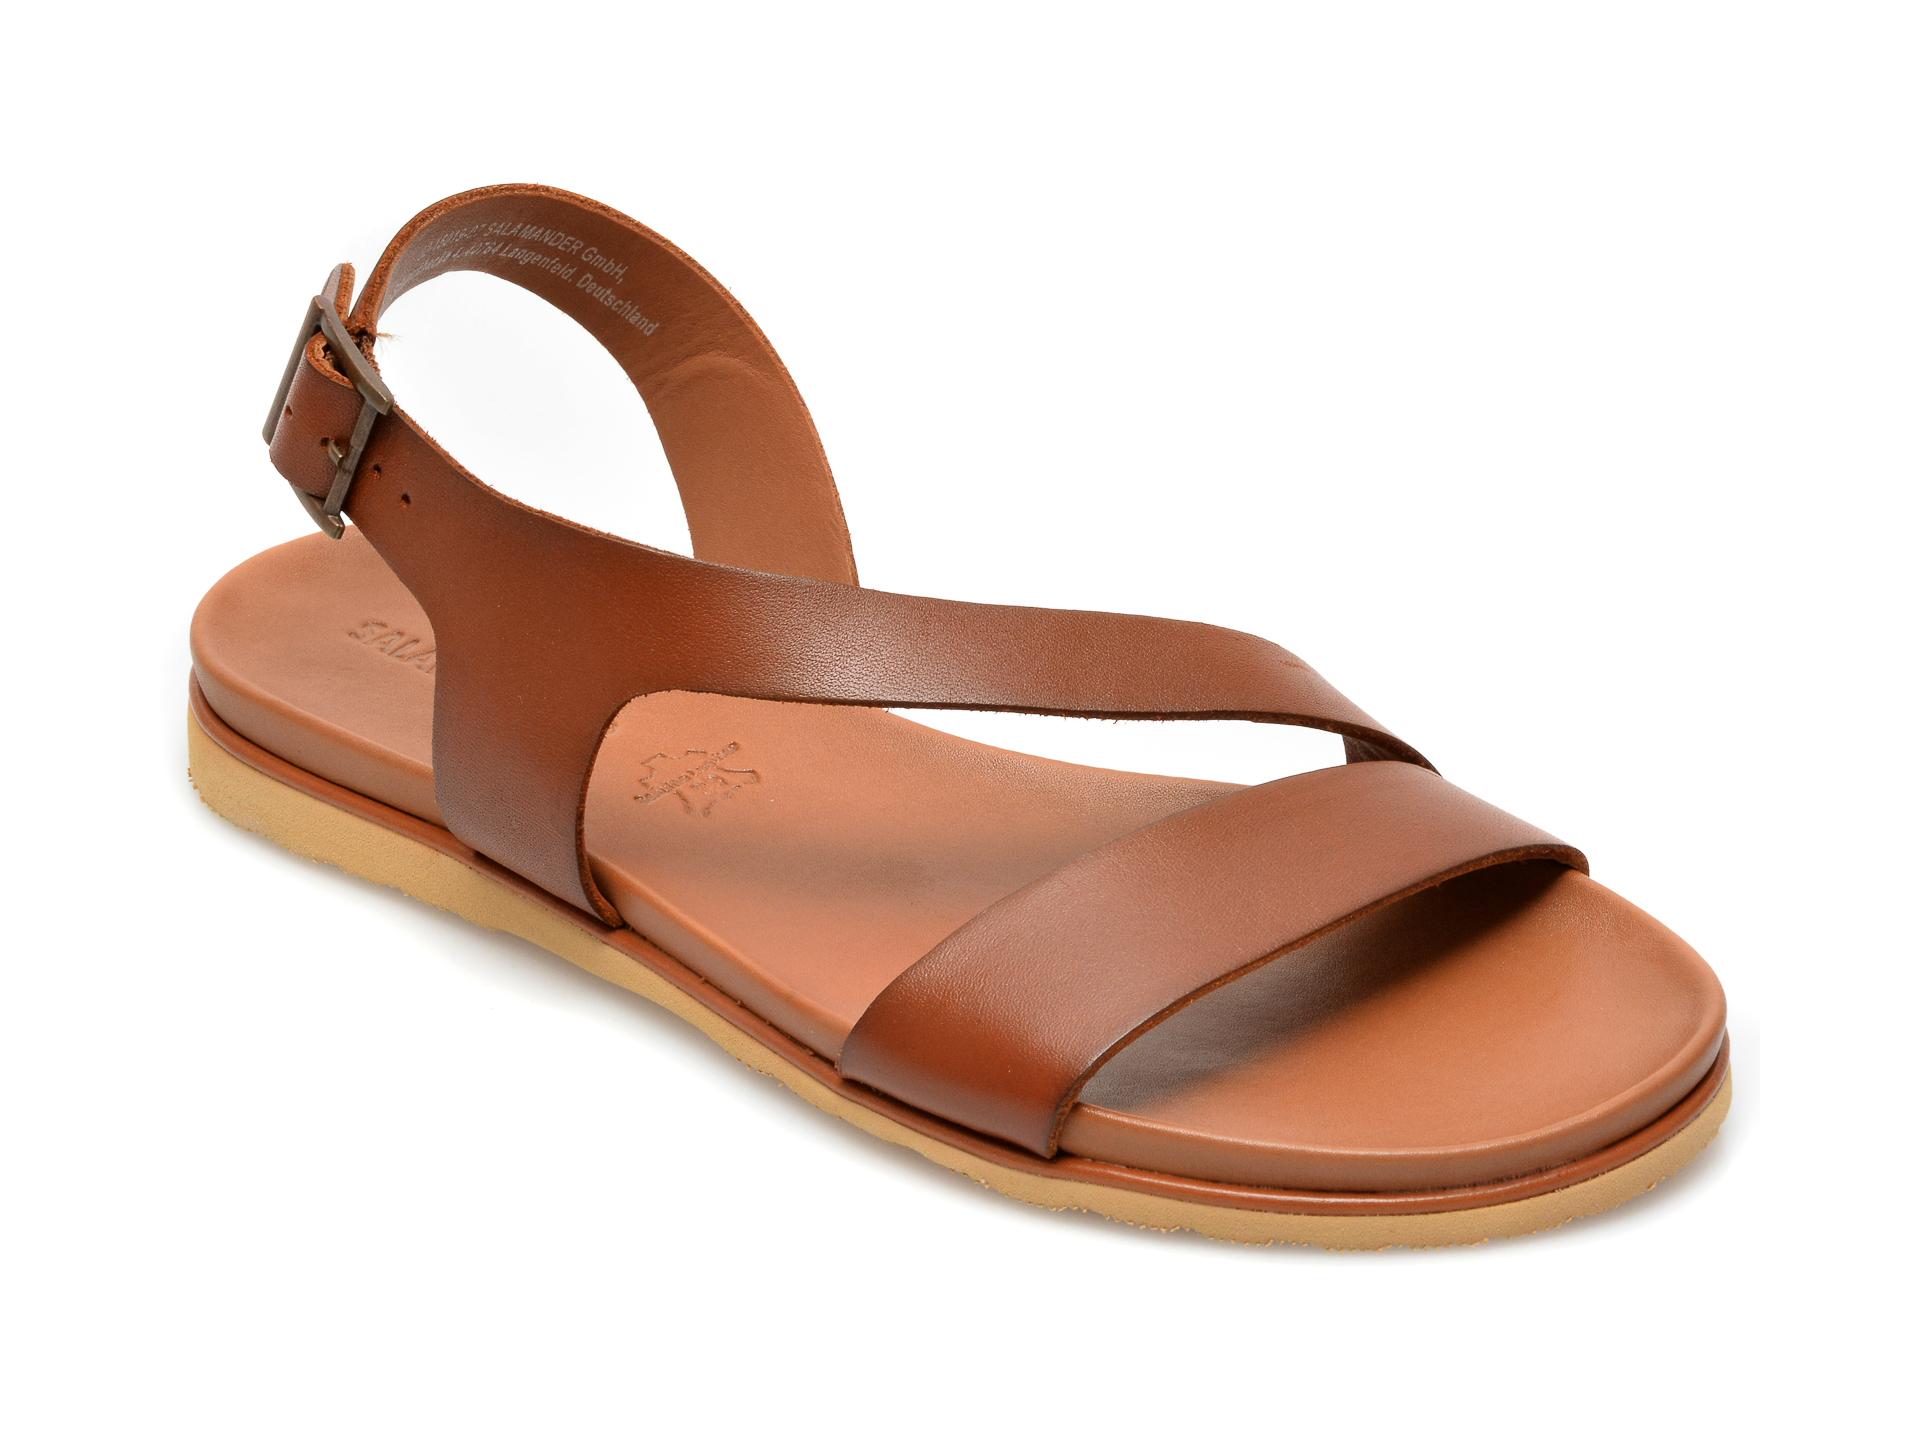 Sandale SALAMANDER maro, 15019, din piele naturala imagine otter.ro 2021